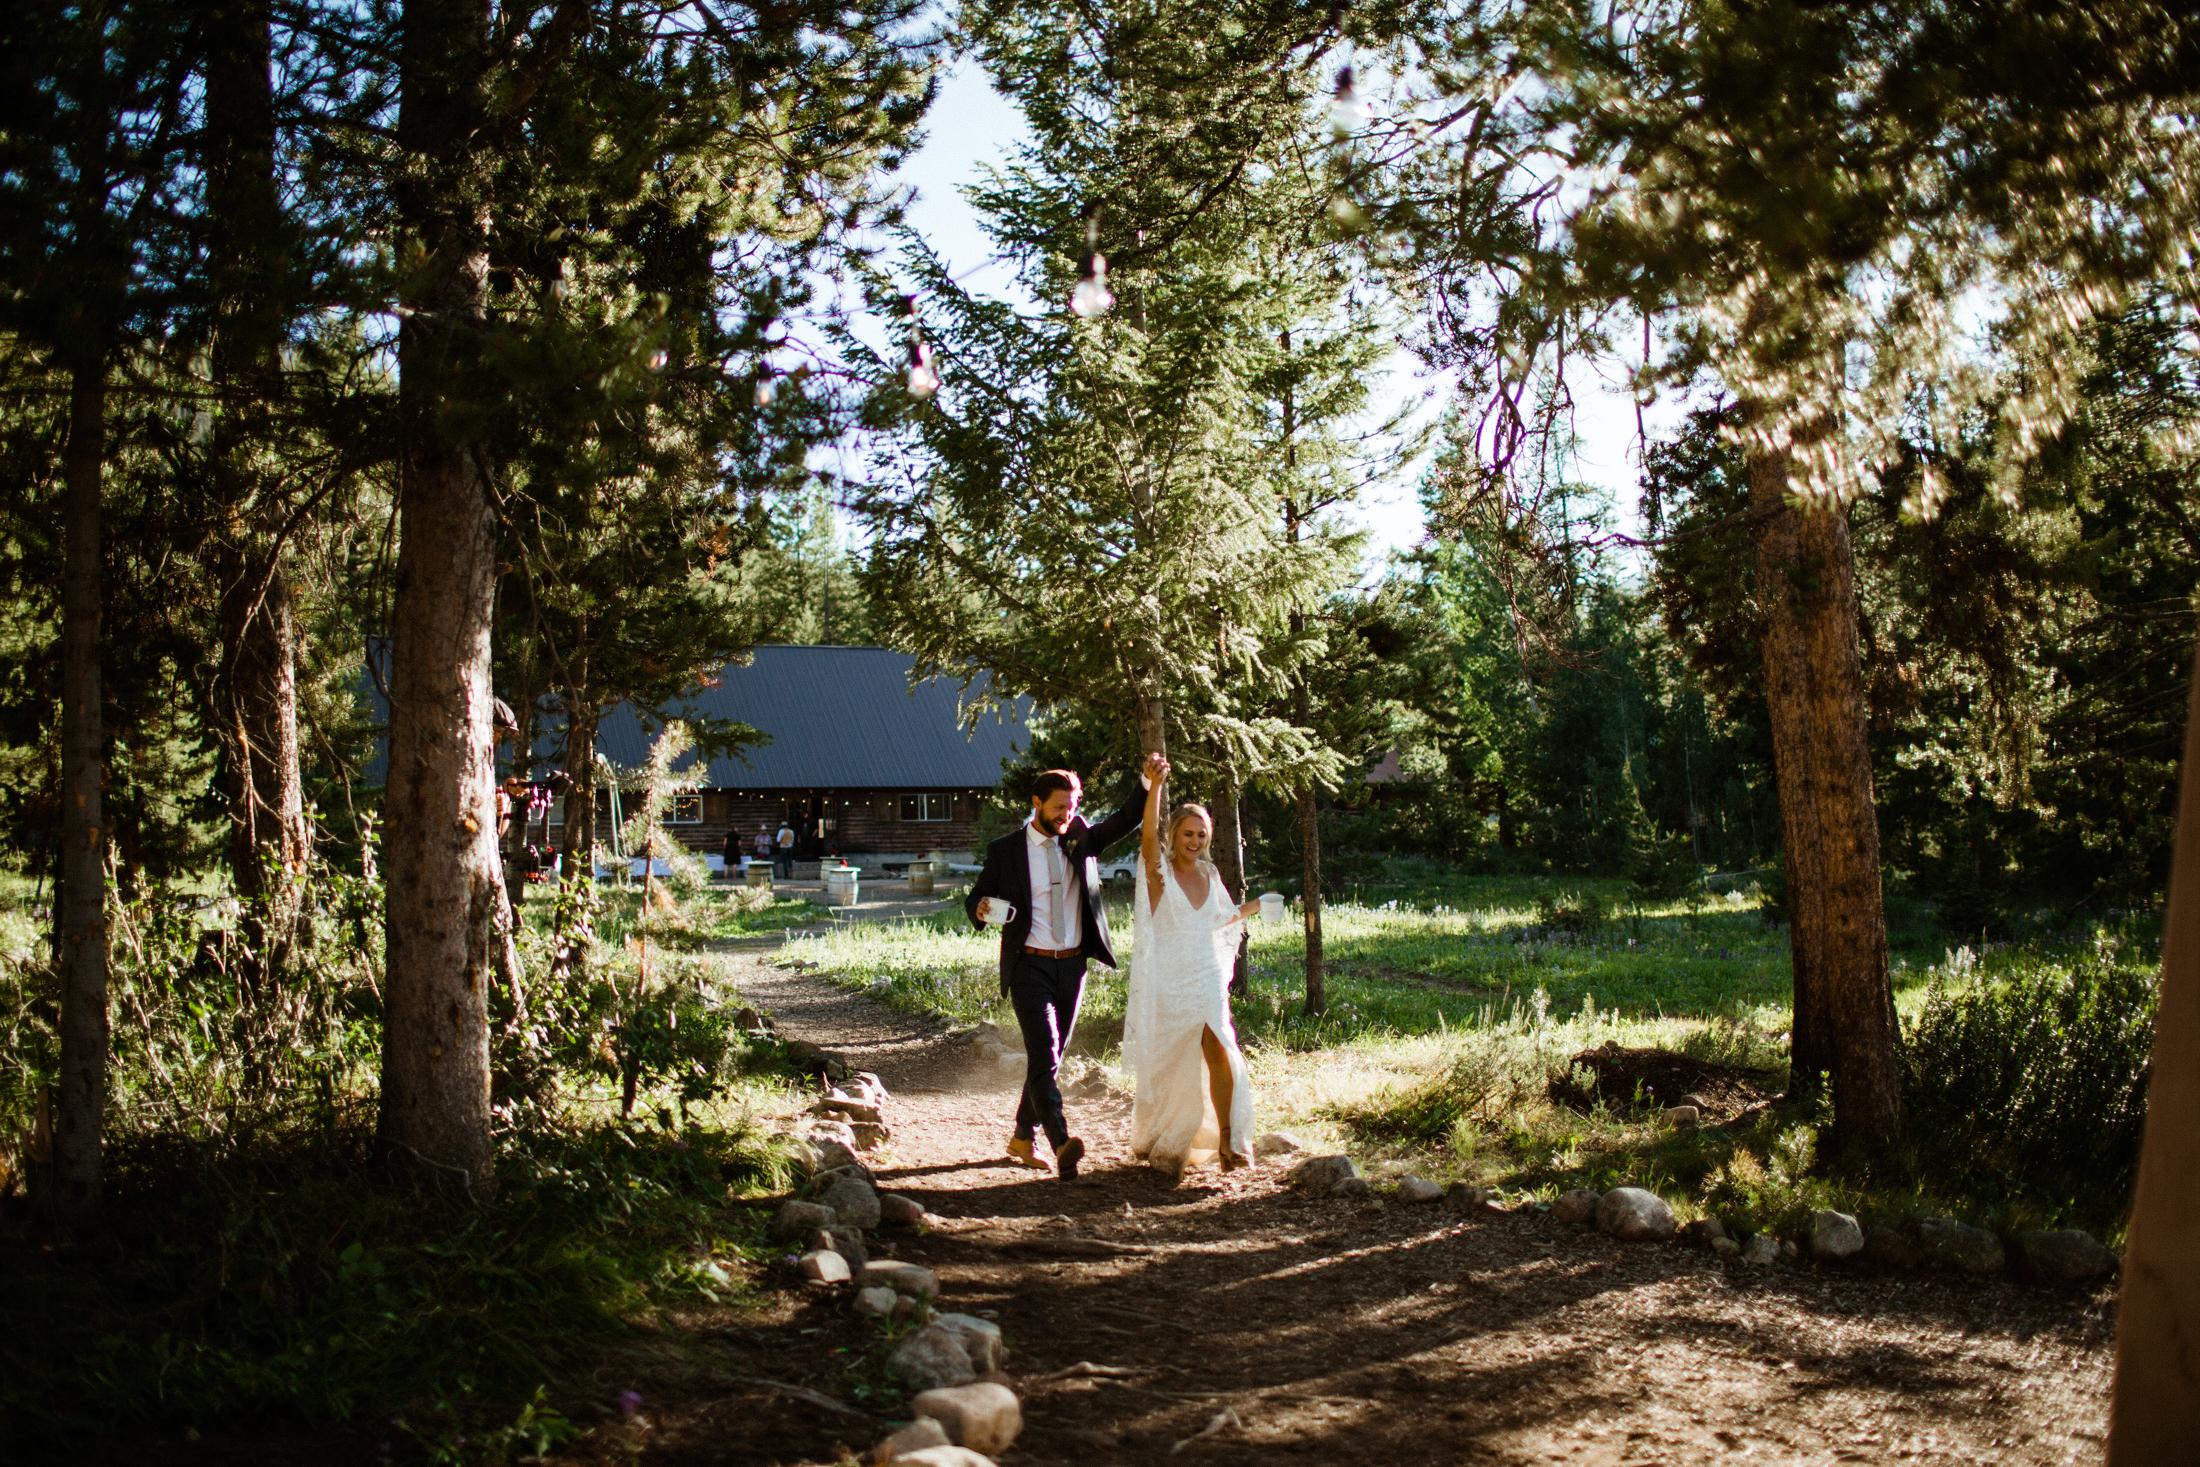 idaho-4h-camp-wedding-christinemarie-147.jpg